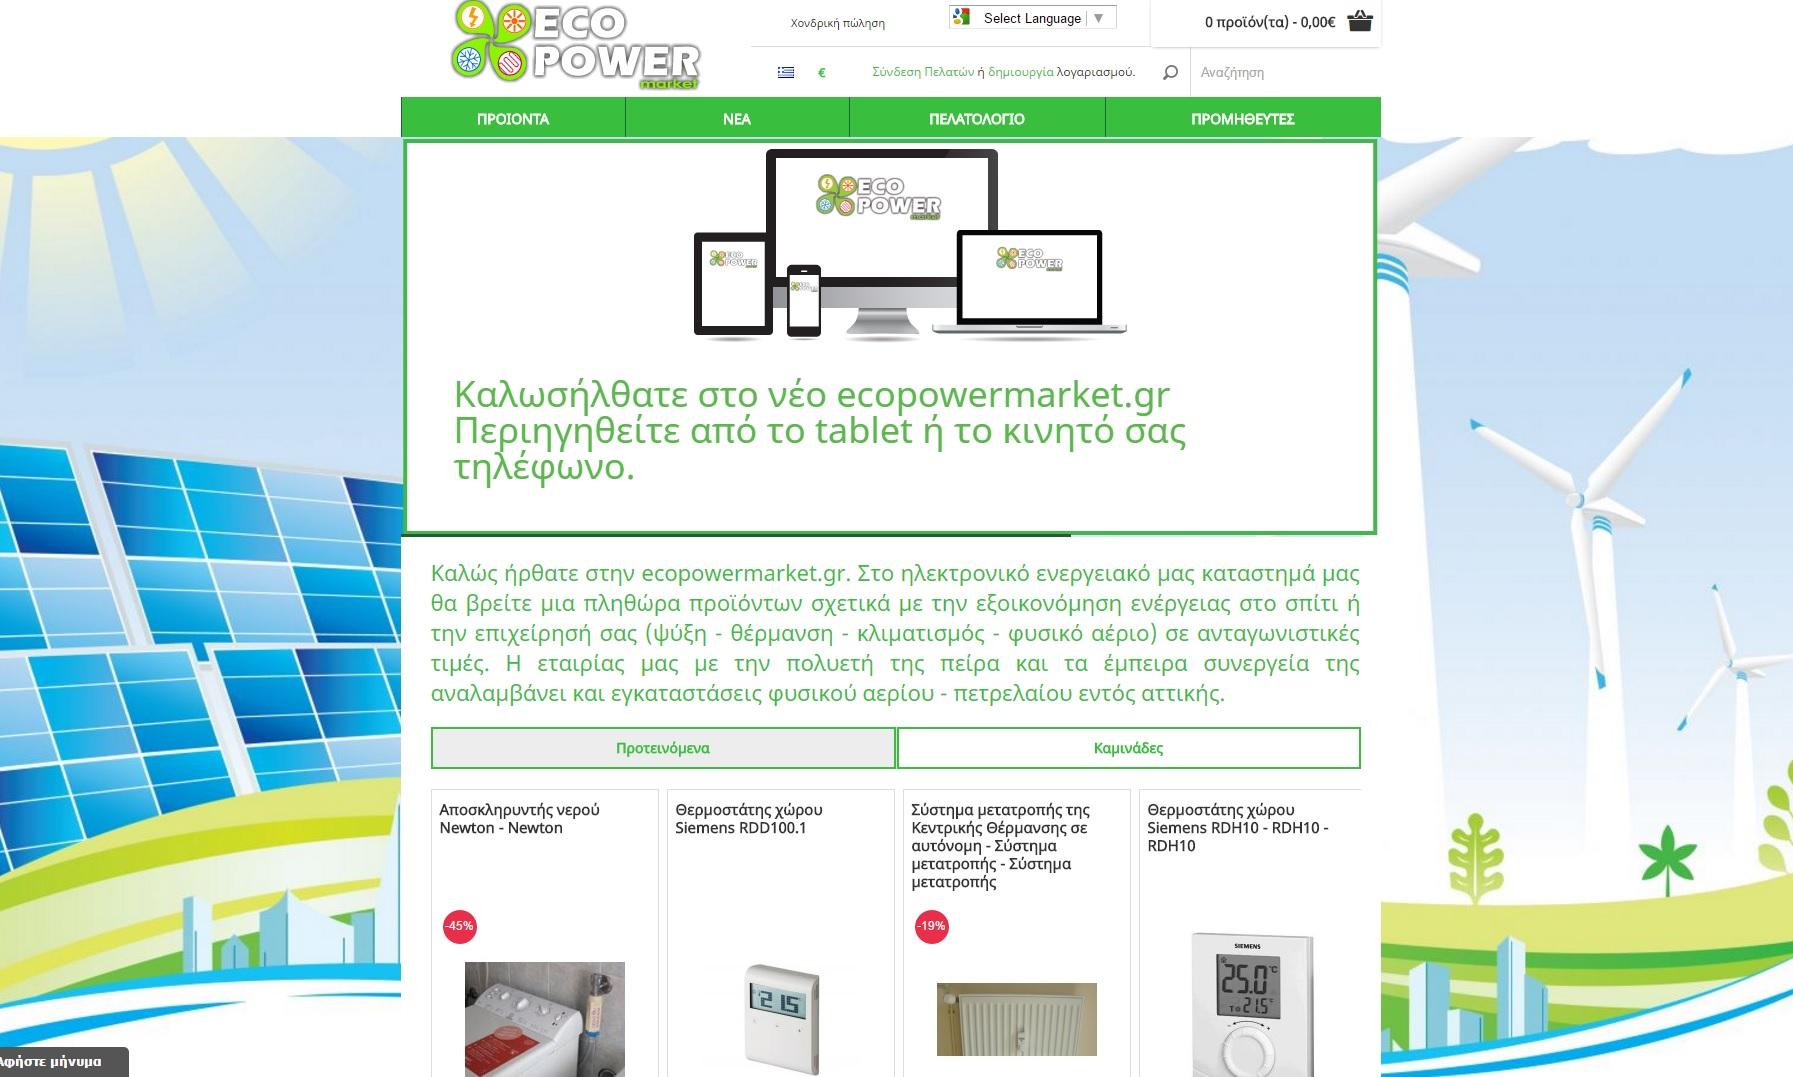 https://jupiweb.com/assets/uploads/files/thumbs/thumb_dc150-ecopowermarket.jpg